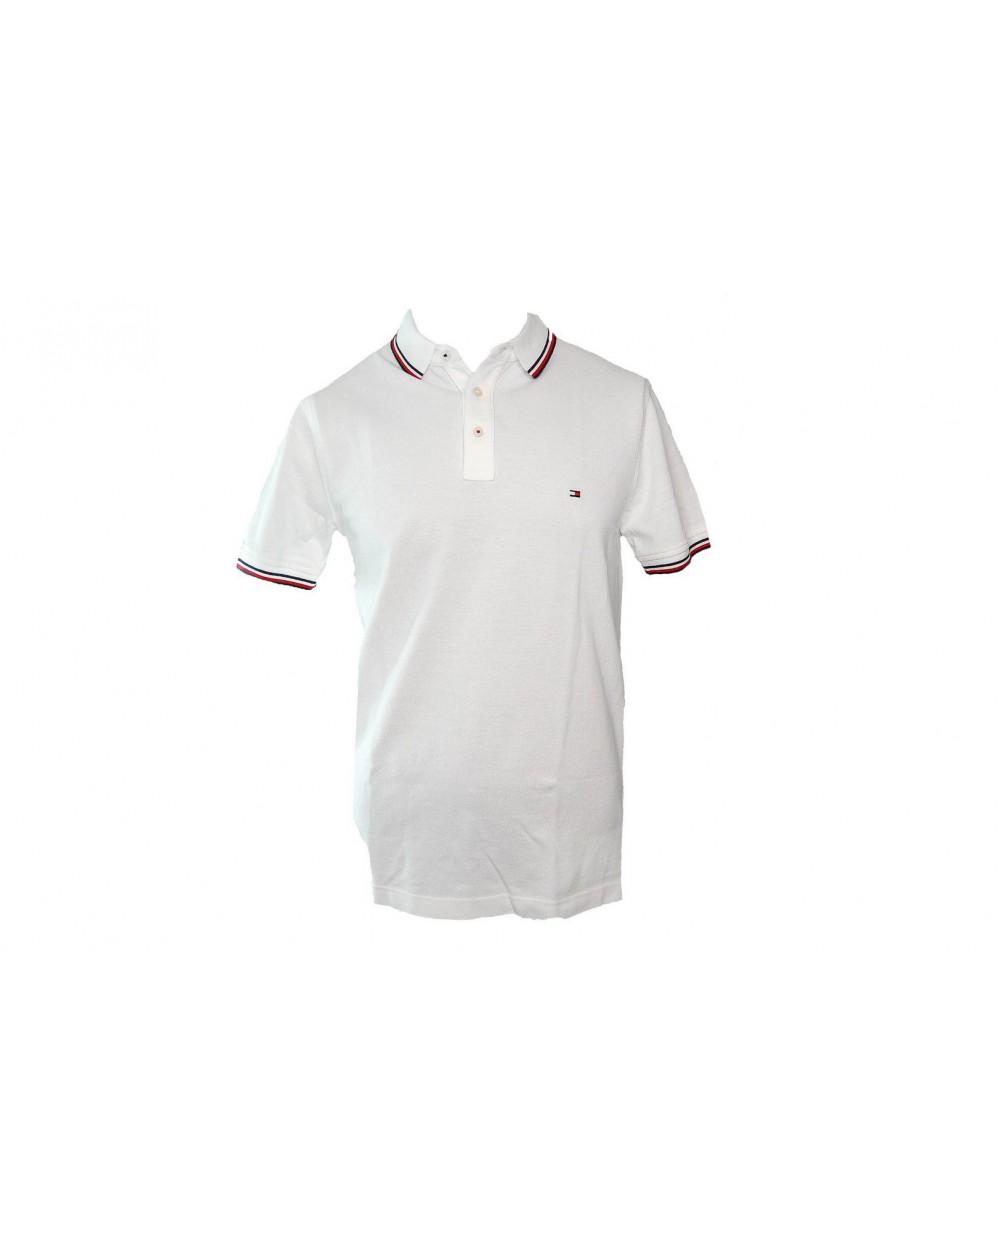 TOMMY HILFIGER- Koszulka Polo